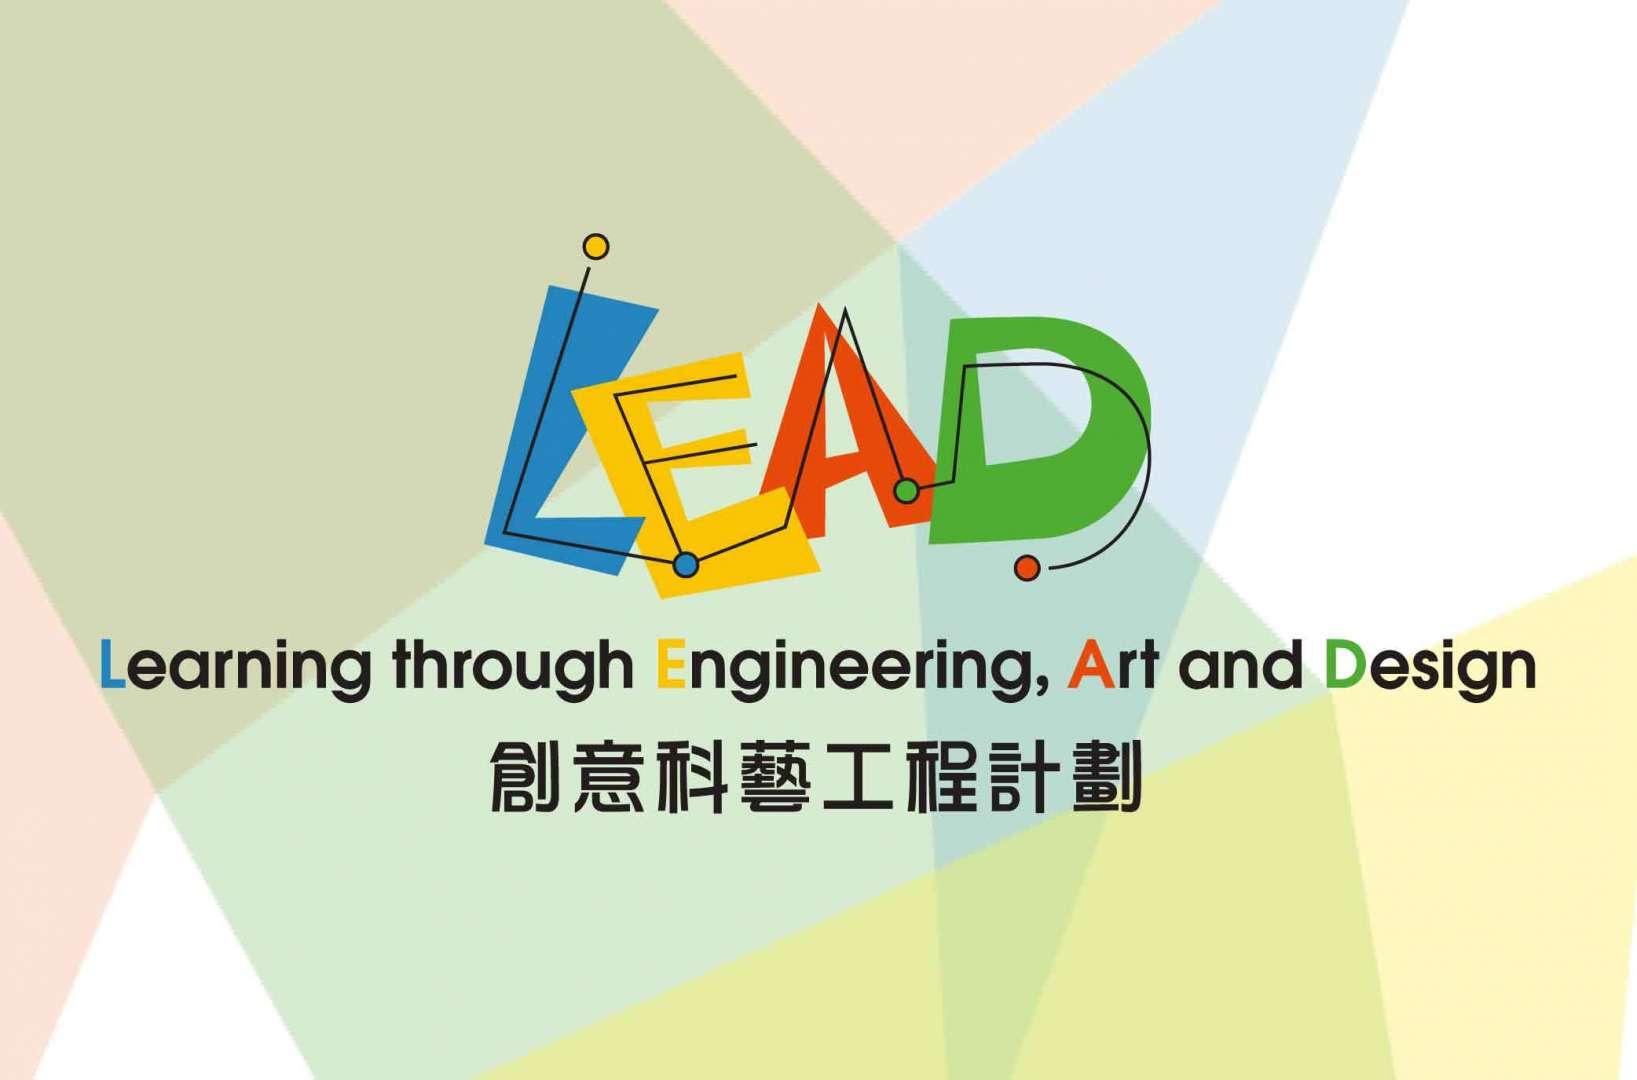 LEAD_Logo_web_banner_500x330-01